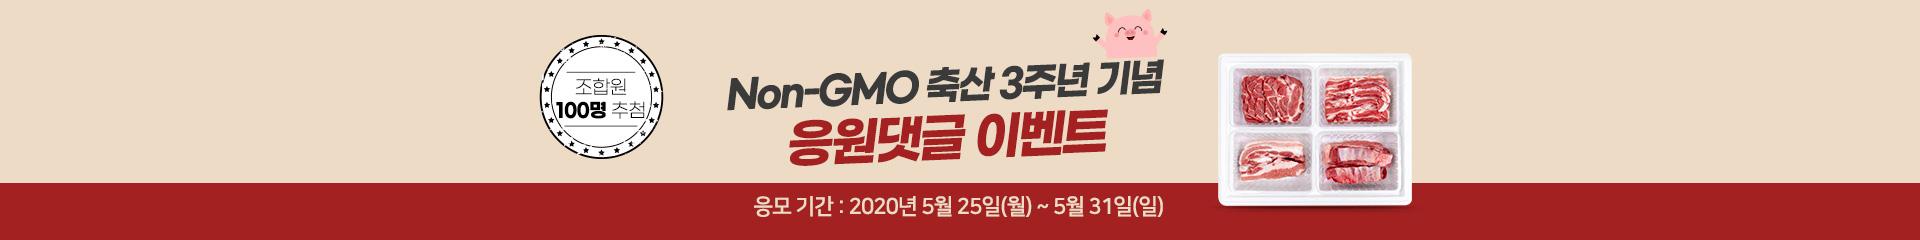 Non-GMO 3주년 응원댓글 이벤트